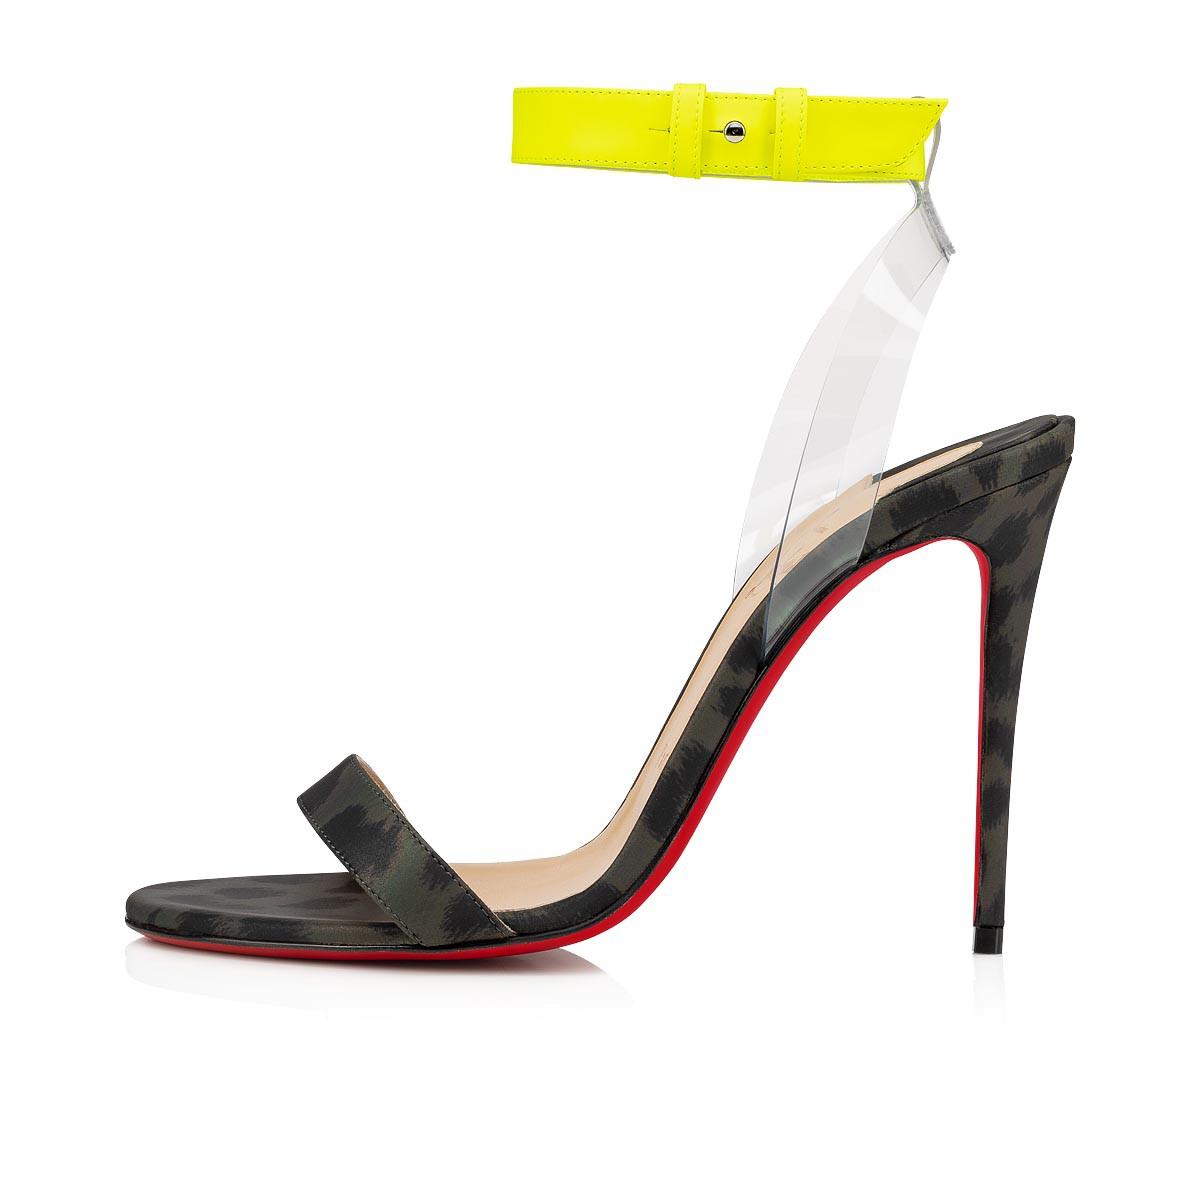 Shoes - Jonatina - Christian Louboutin